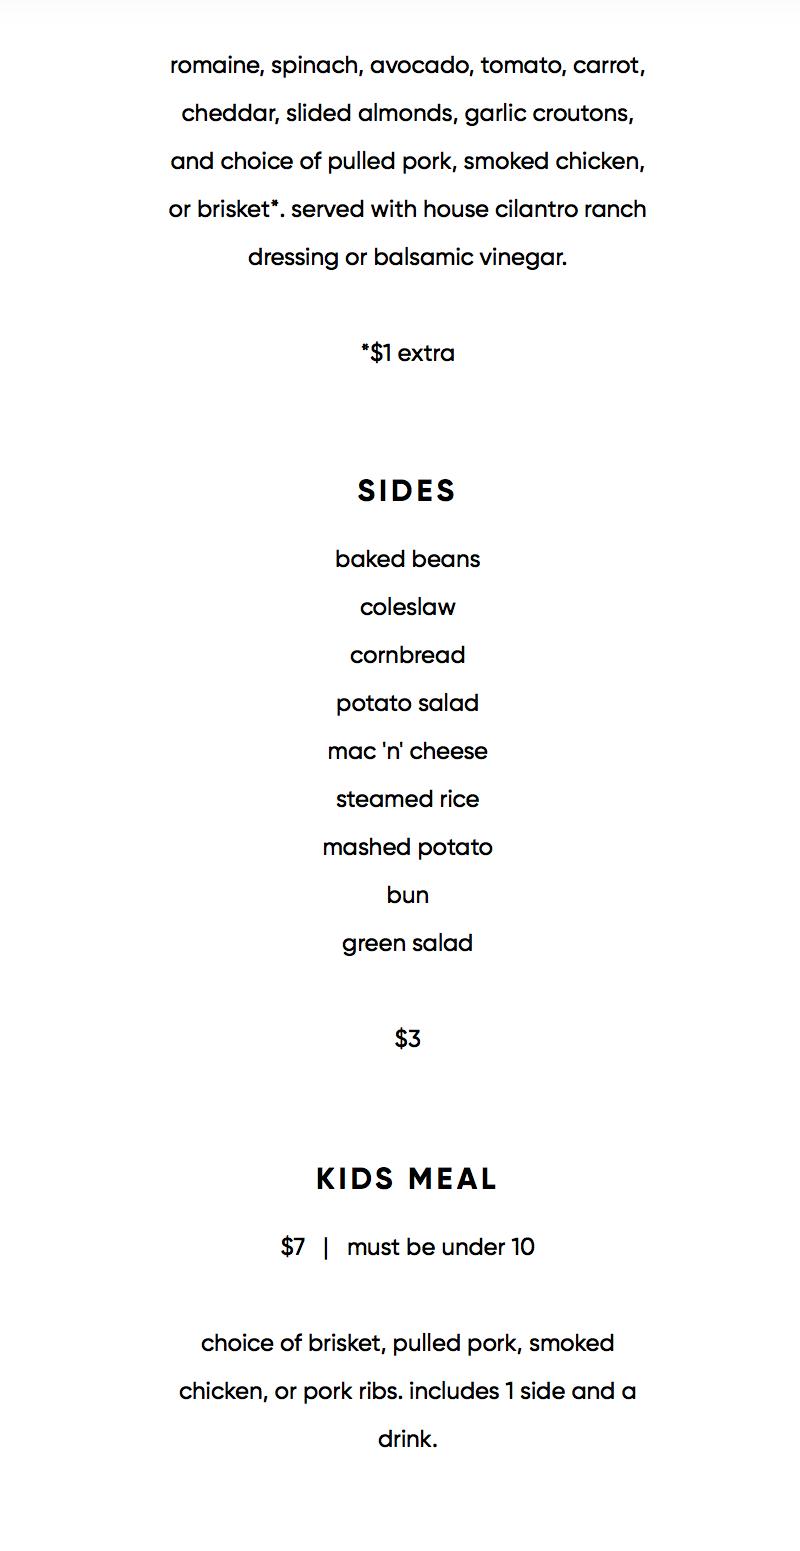 565 Firehouse menu - salads and sides